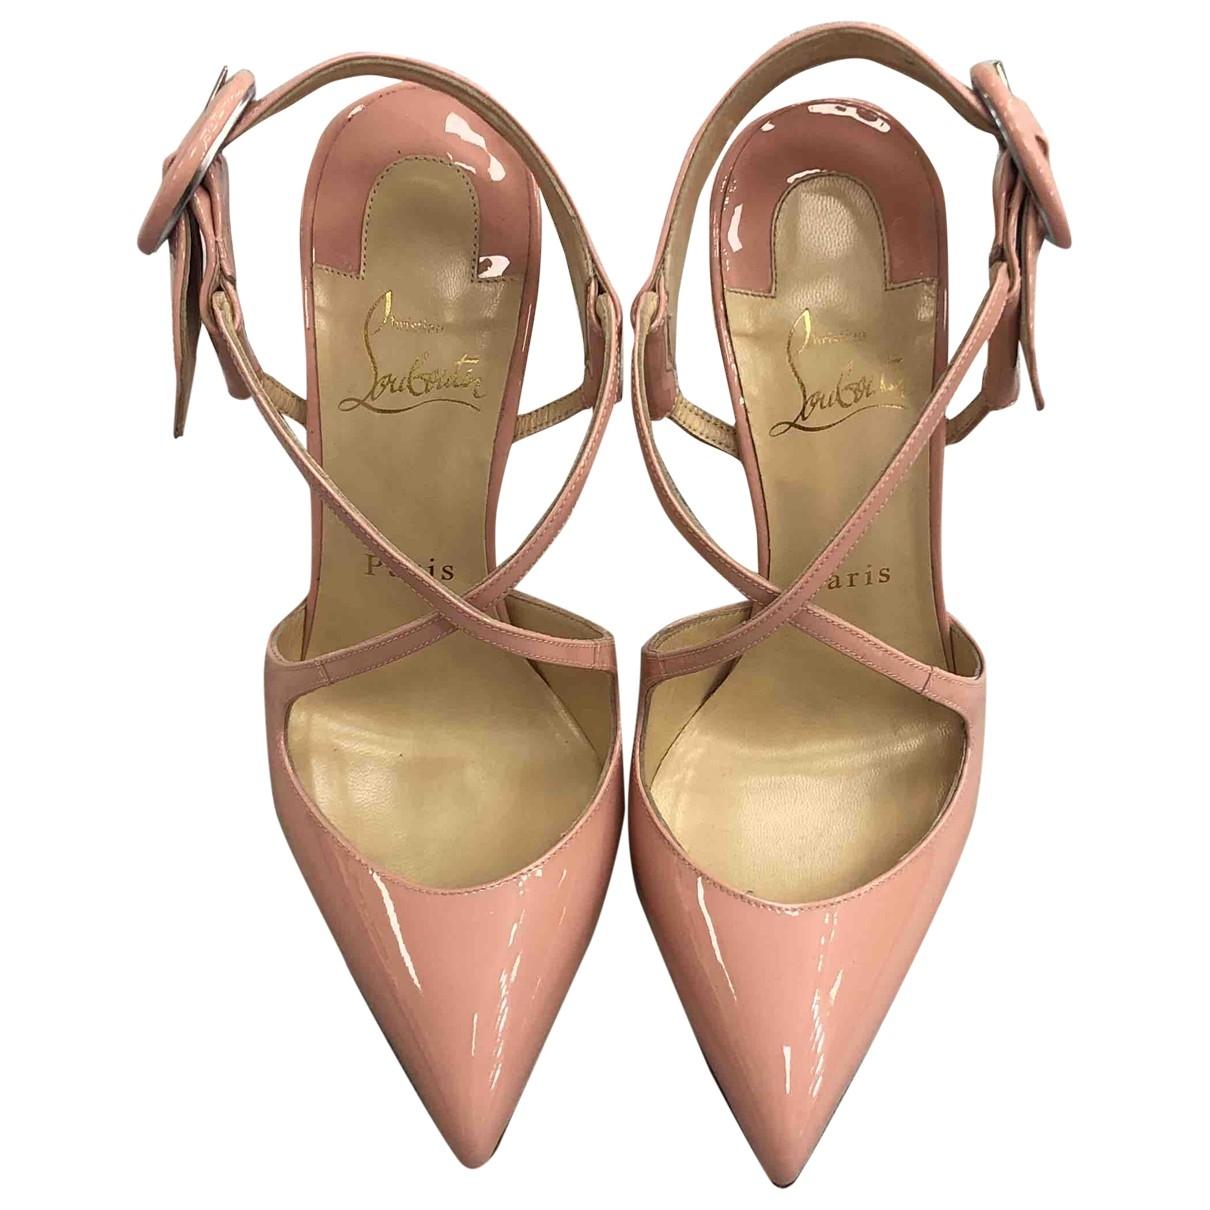 Christian Louboutin \N Pink Patent leather Heels for Women 37 EU